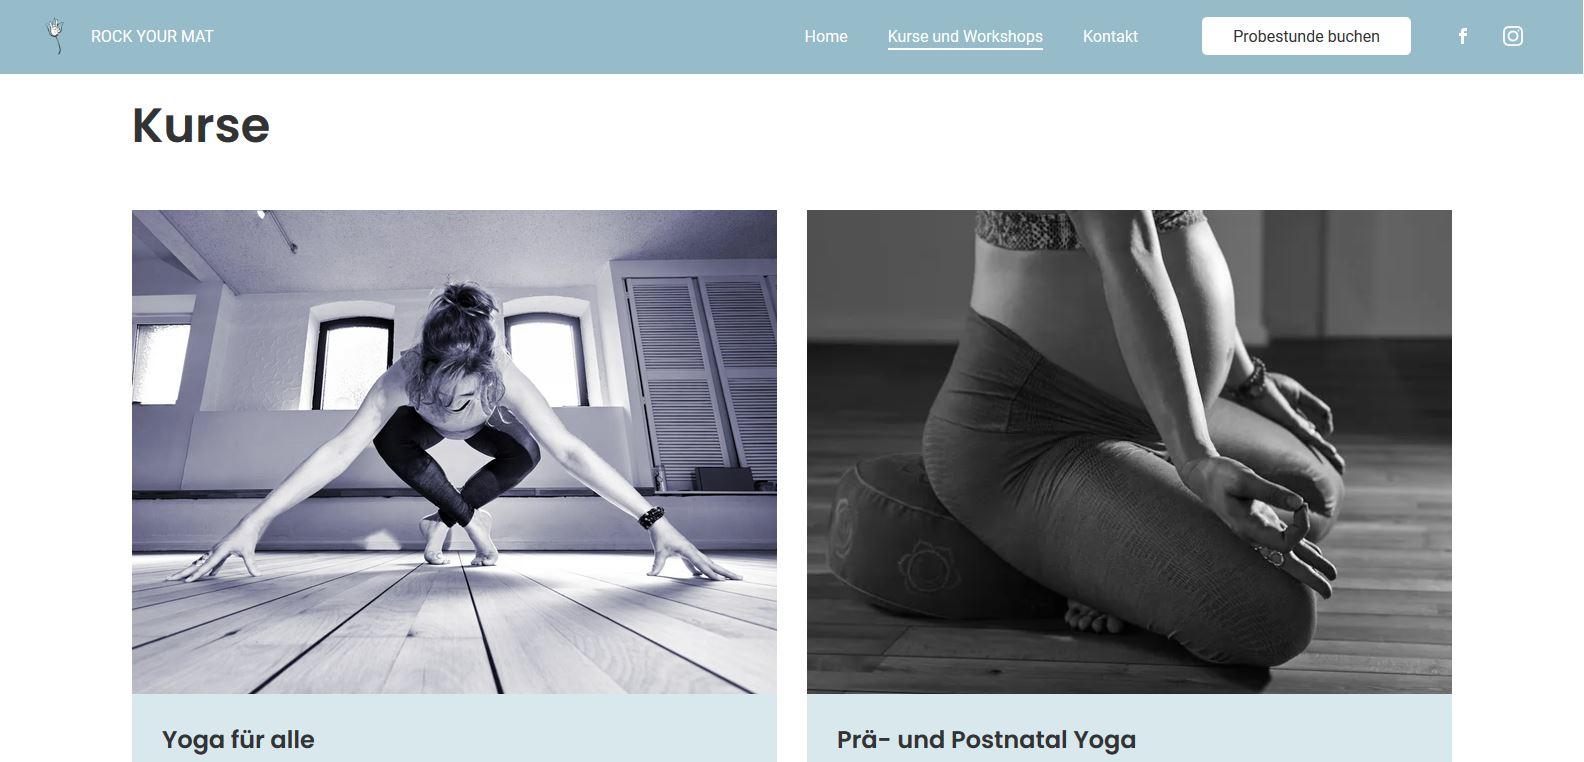 Website Rock your mat